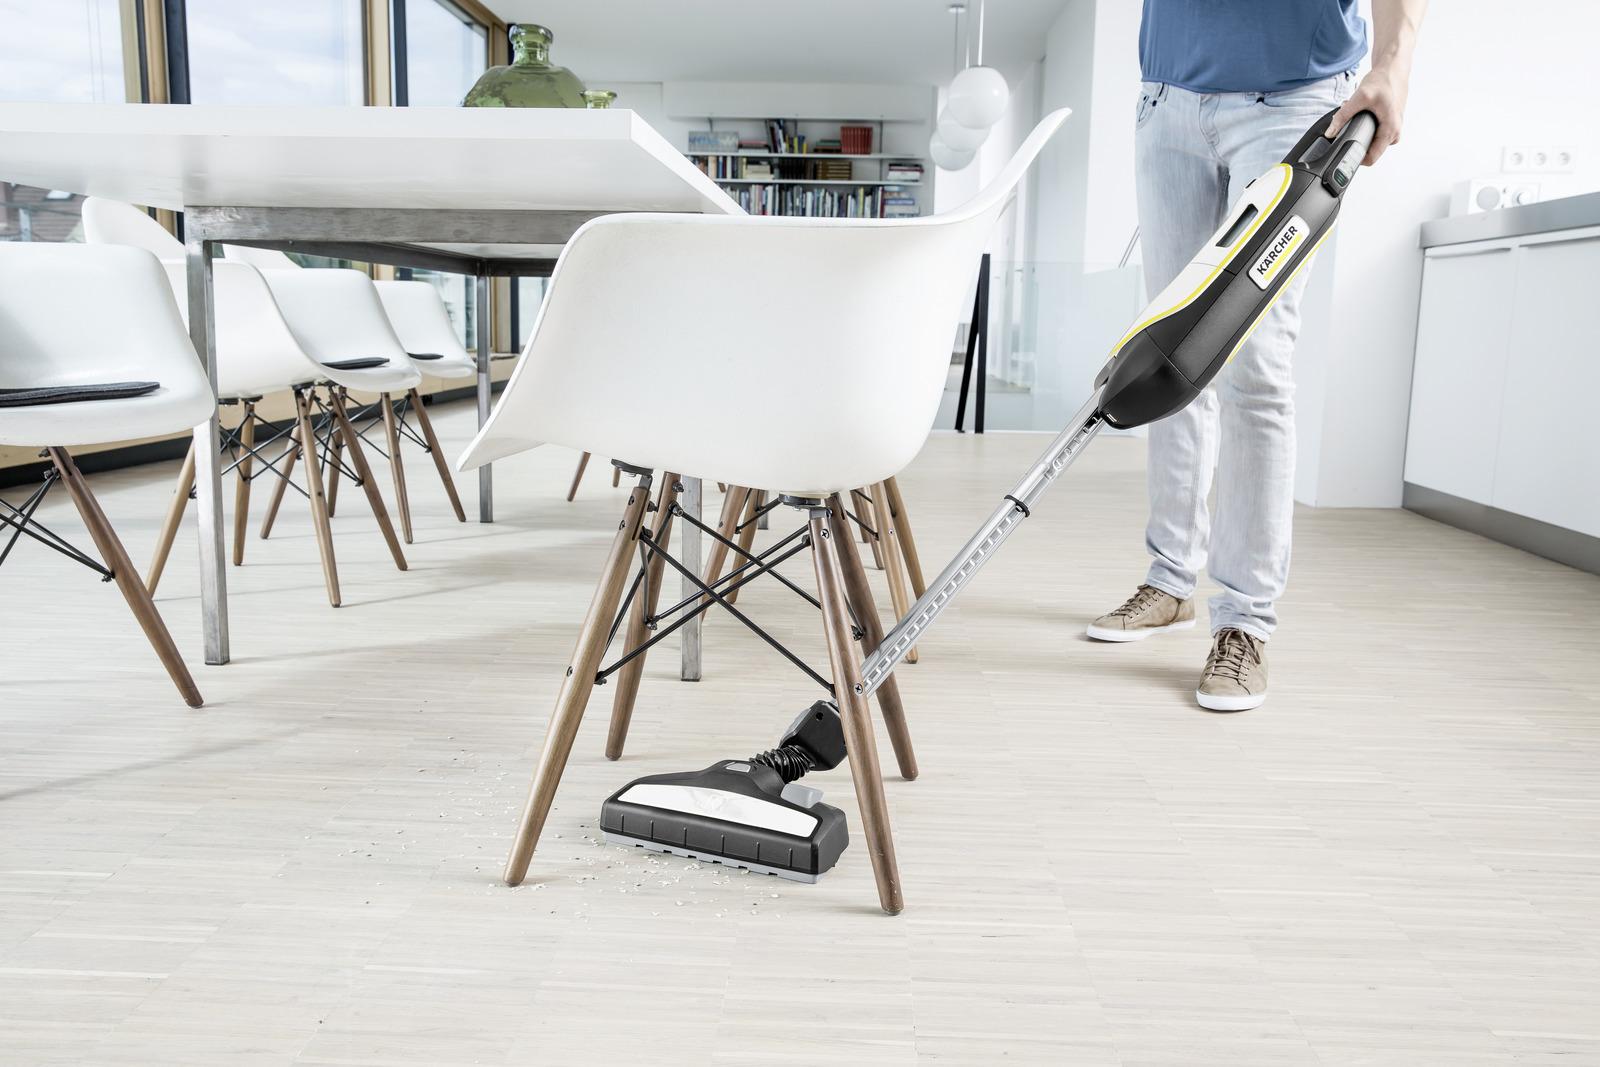 handstaubsauger vc 5 cordless premium k rcher. Black Bedroom Furniture Sets. Home Design Ideas